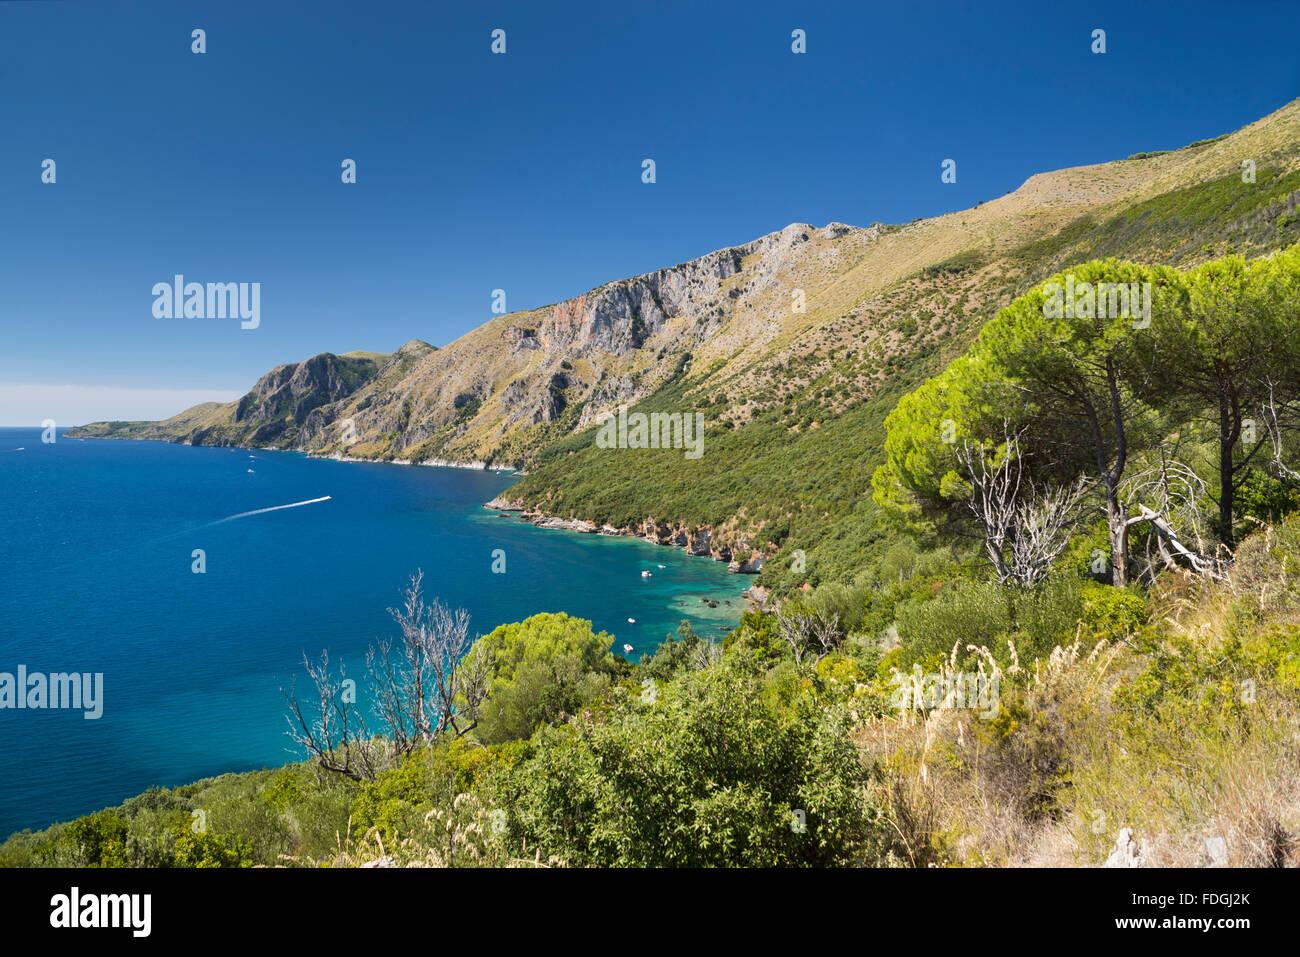 The wild coast Costa di Masseta between Scario and Marina di Camerota in southern Cilento, Campania, Italy - Stock Image